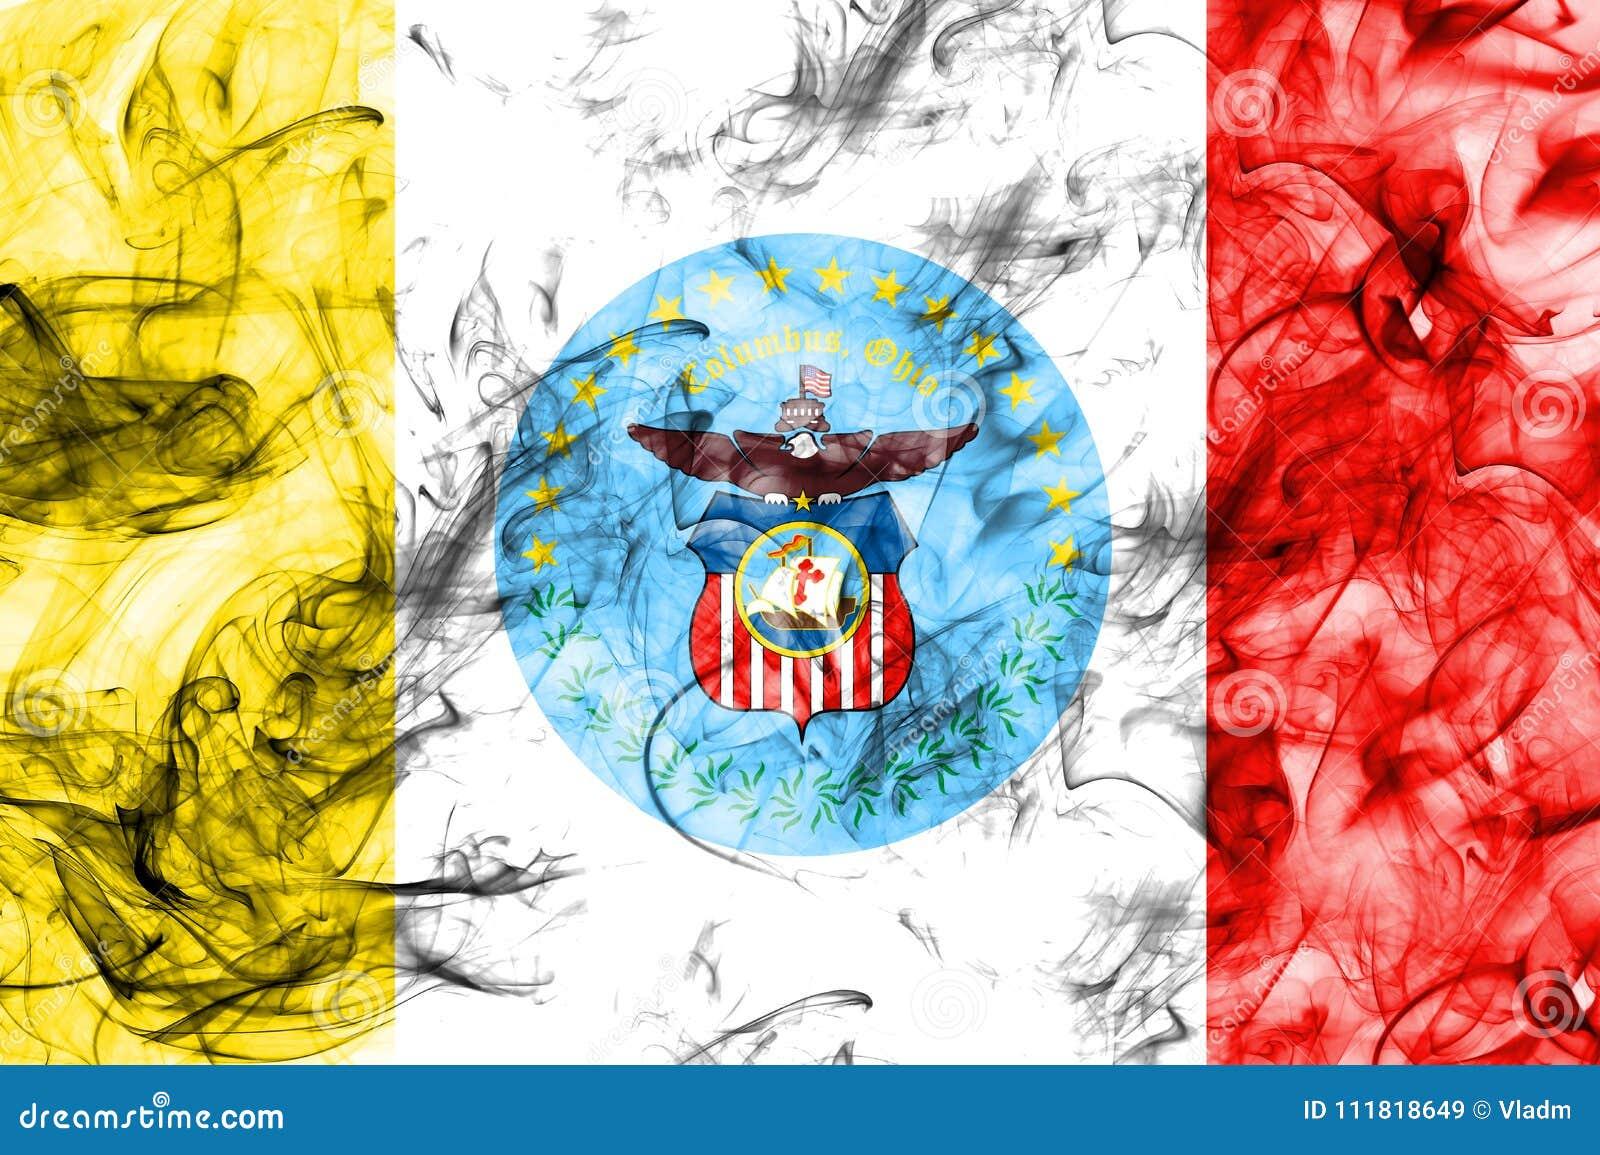 Columbus city smoke flag, Ohio State, United States Of America